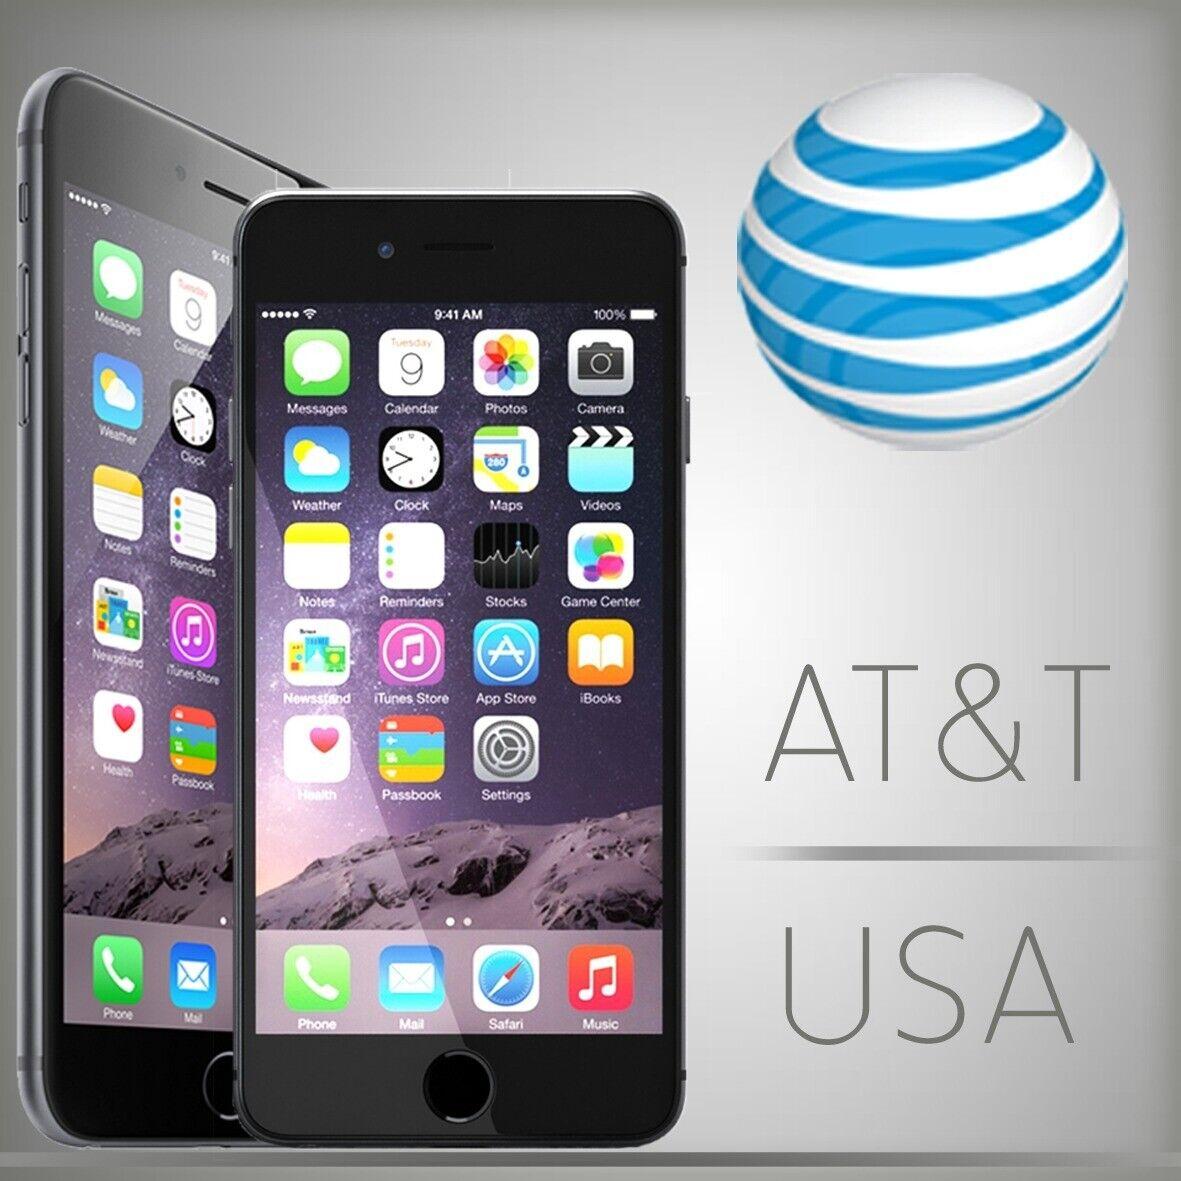 AT T USA IPhone 13 Pro Max Semi Premium UNLOCK SERVICE - $240.00